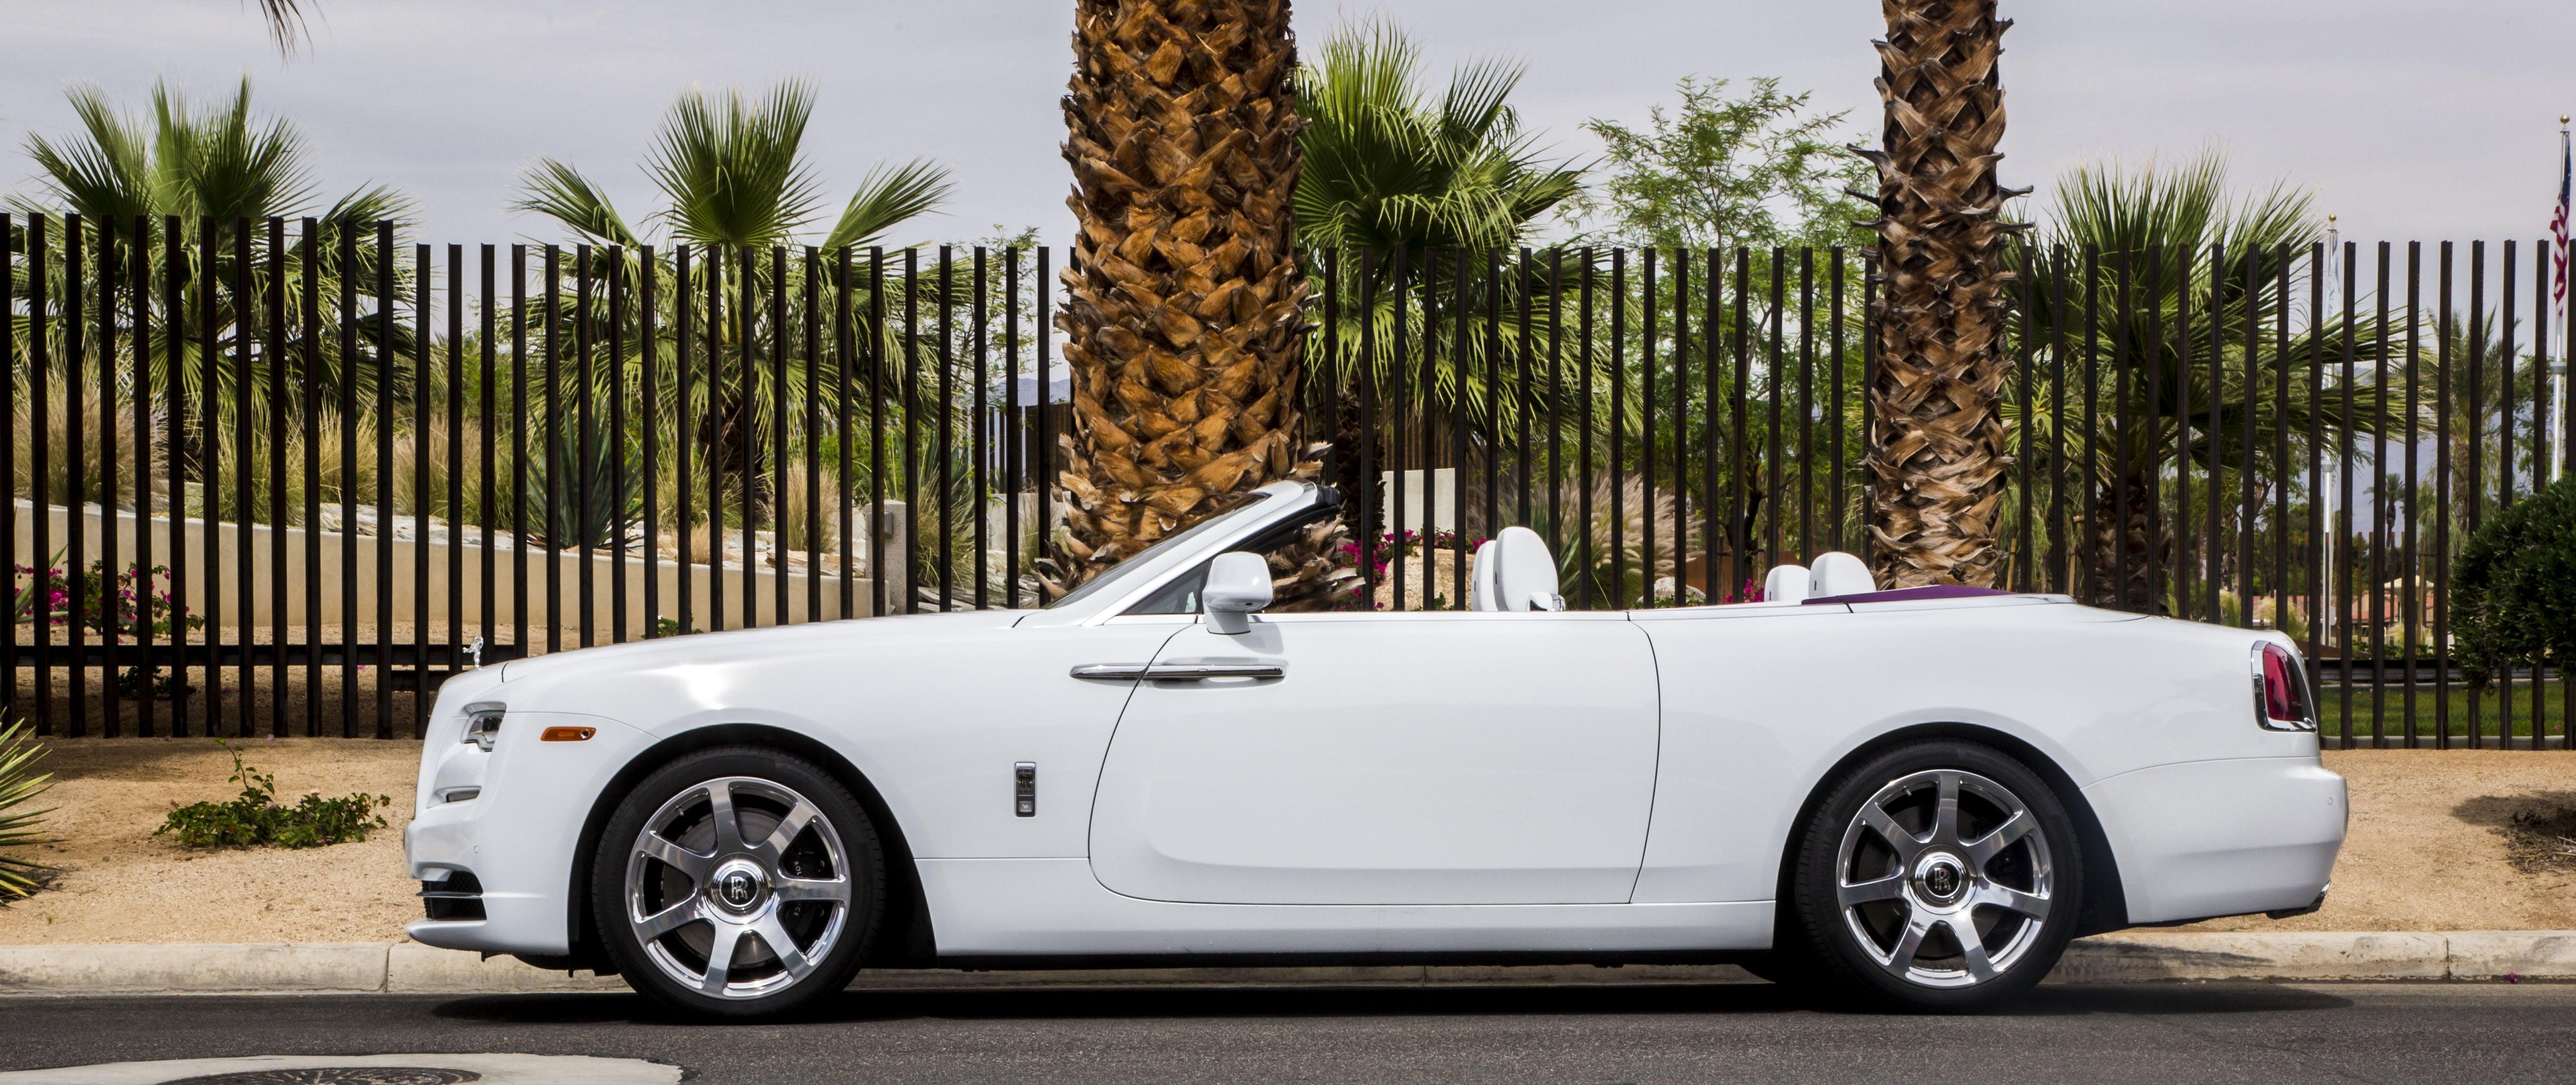 Rolls-Royce Motor Cars Orange County, Irvine, CA ... |Rolls Royce Dealerships California